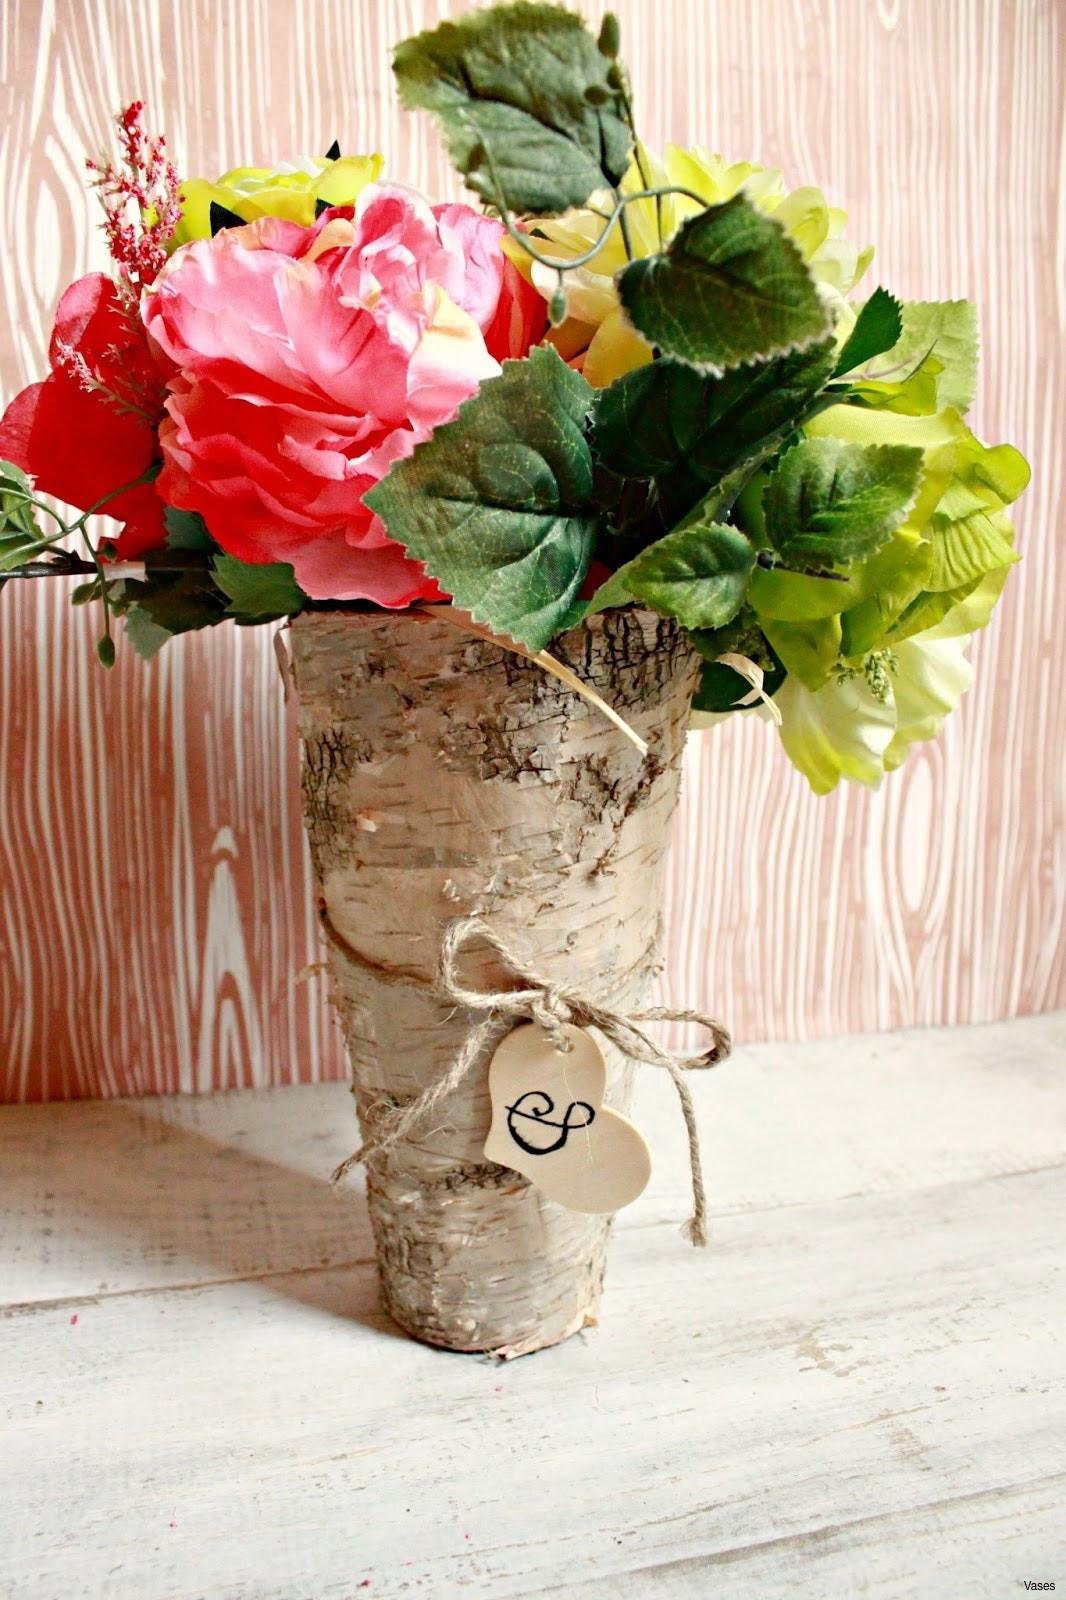 wall mounted flower vase of wooden wall vase beautiful wooden wedding flowers h vases diy wood with wooden wall vase beautiful wooden wedding flowers h vases diy wood vase i 0d base turntable